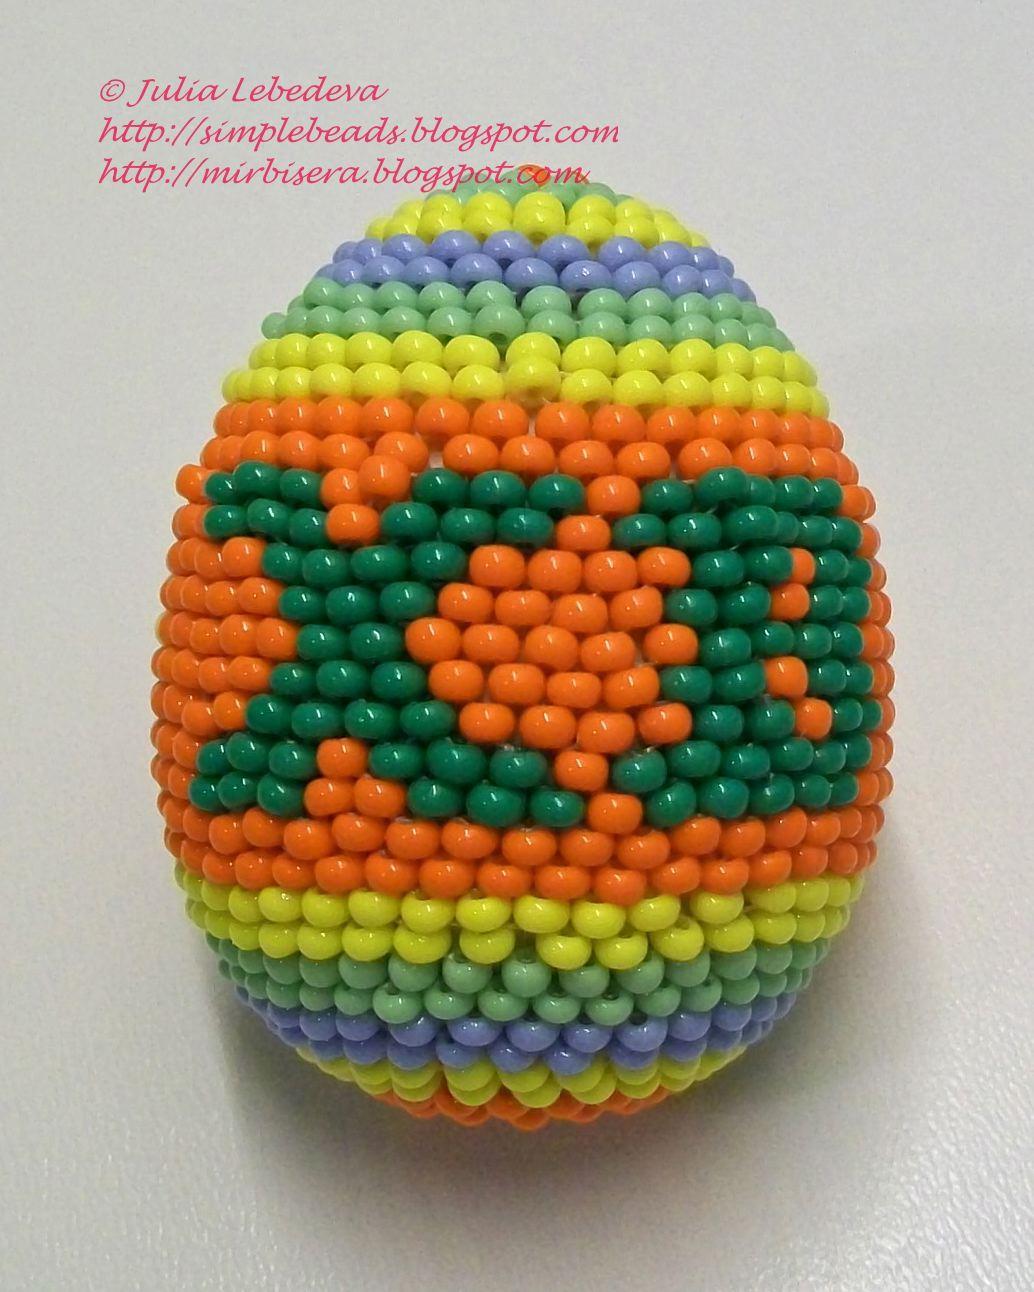 яйца из бисера схемы мастер класс